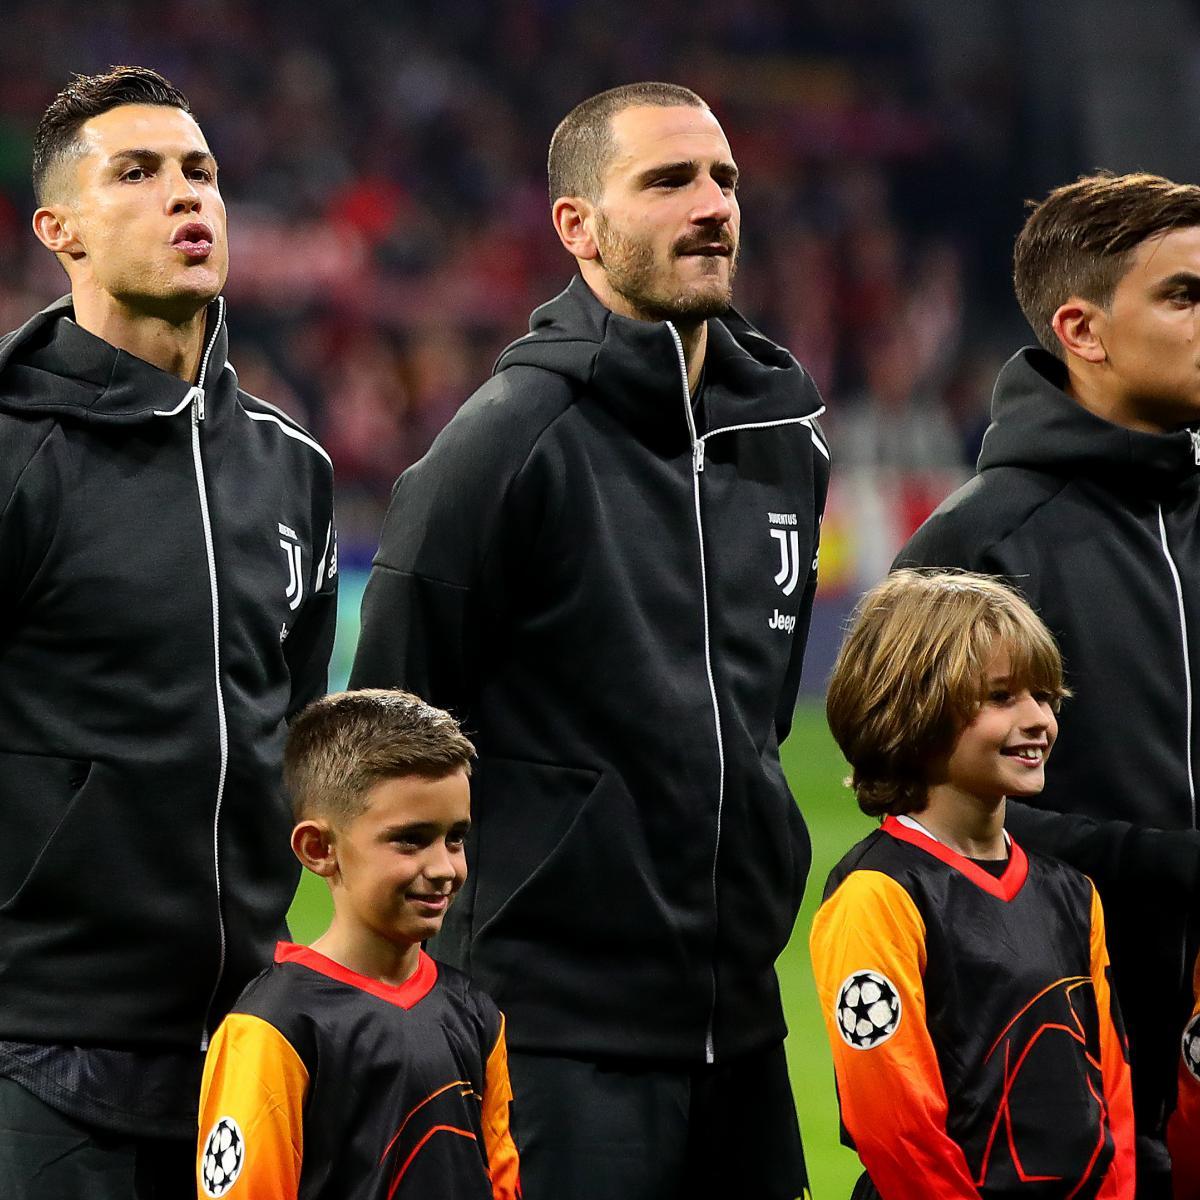 Tottenham Vs Ajax Odds Live Stream And Tv Info For Ucl: Ajax Vs. Juventus: Odds, Live Stream, TV Info For UCL